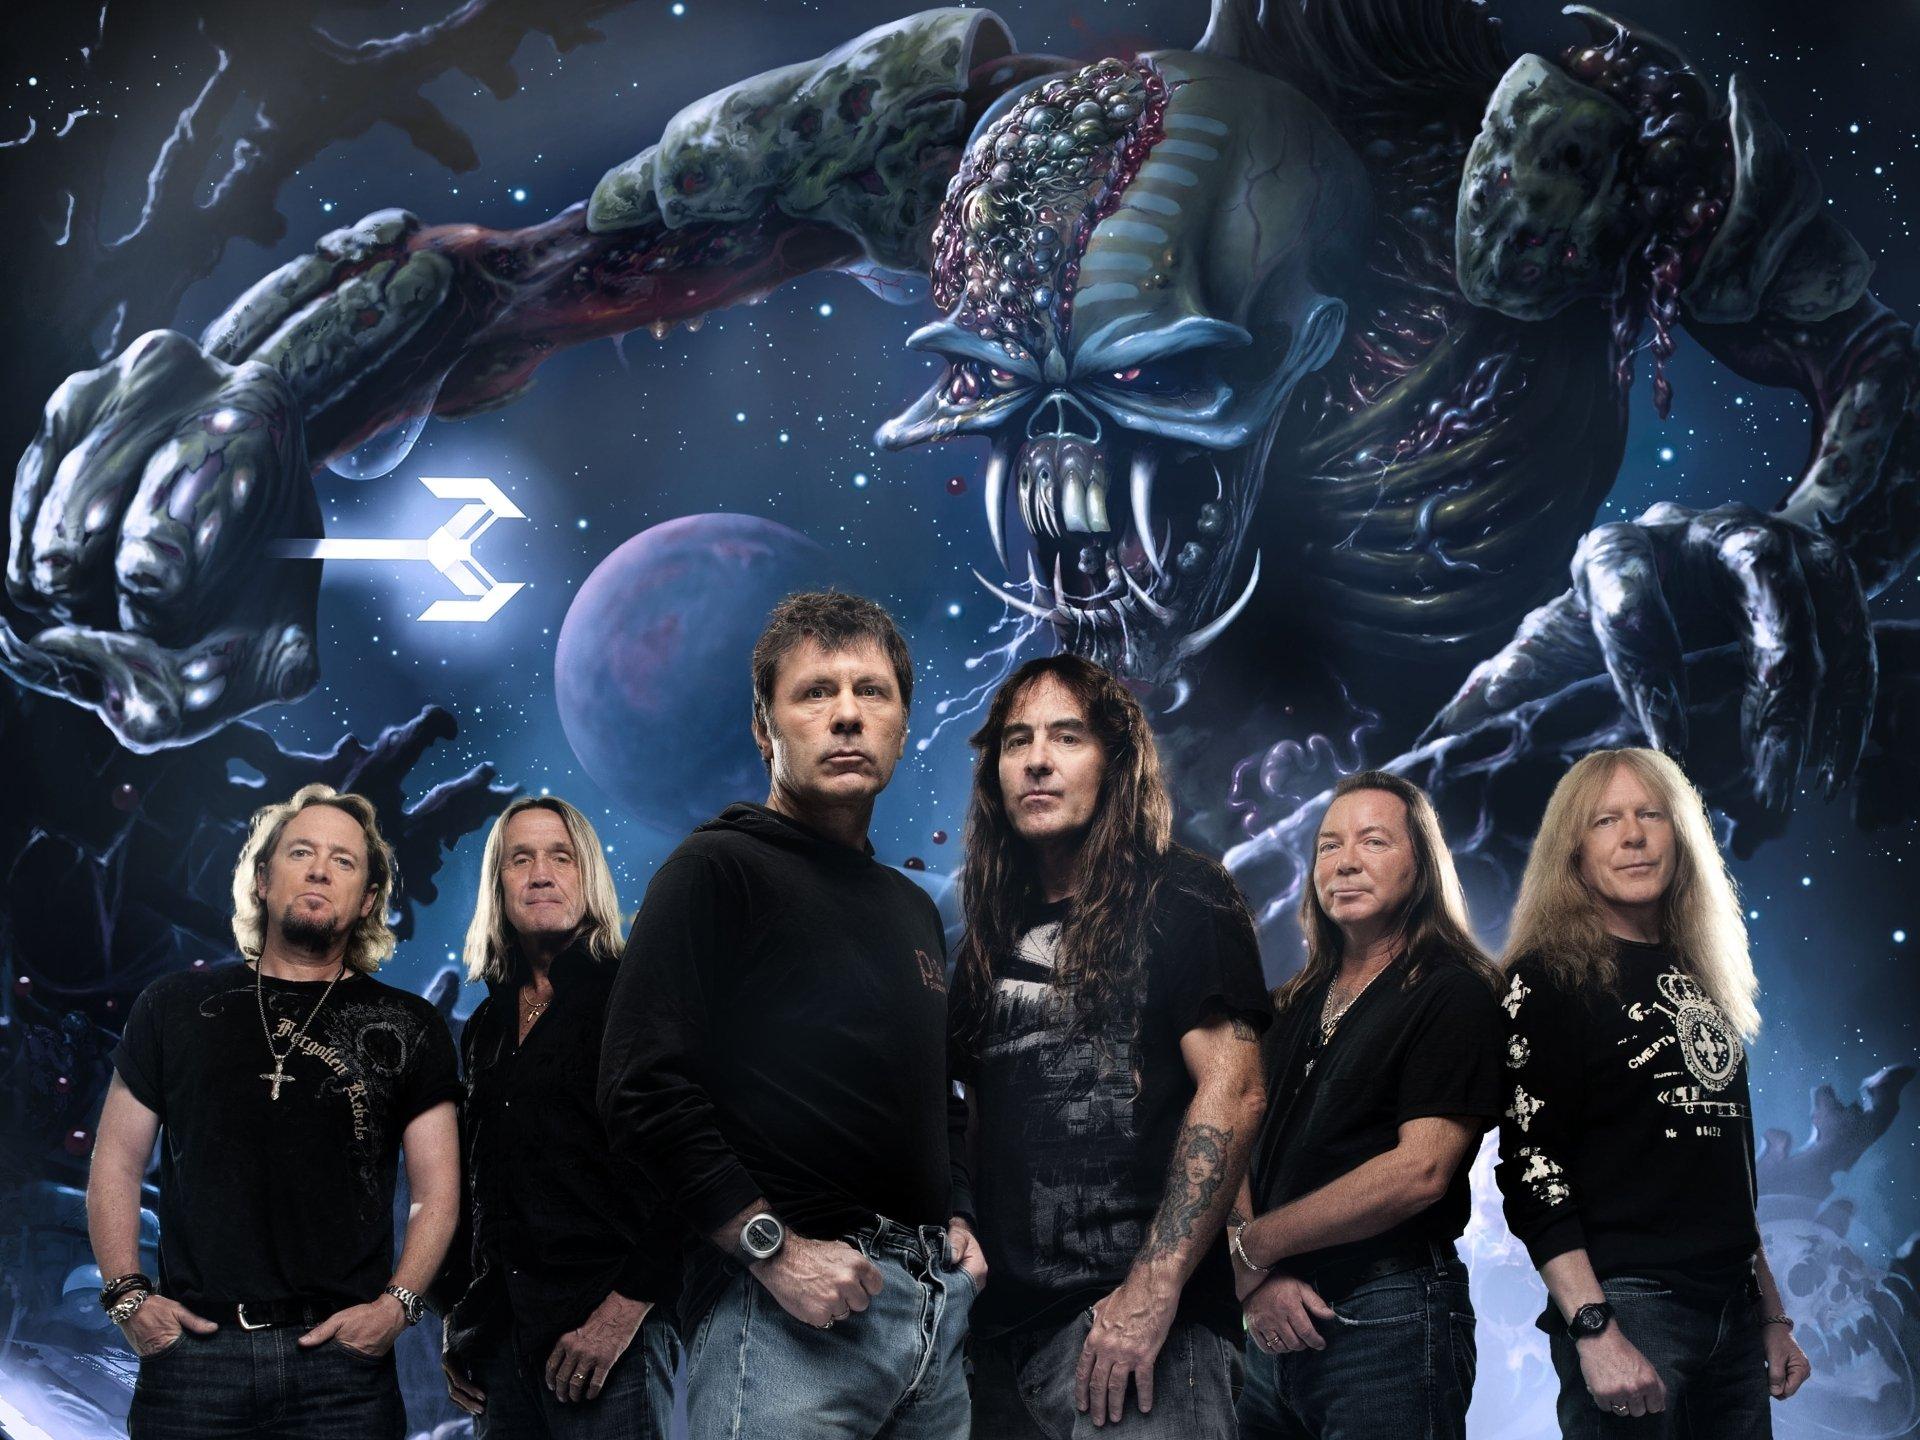 Хеви метал картинки на рабочий стол